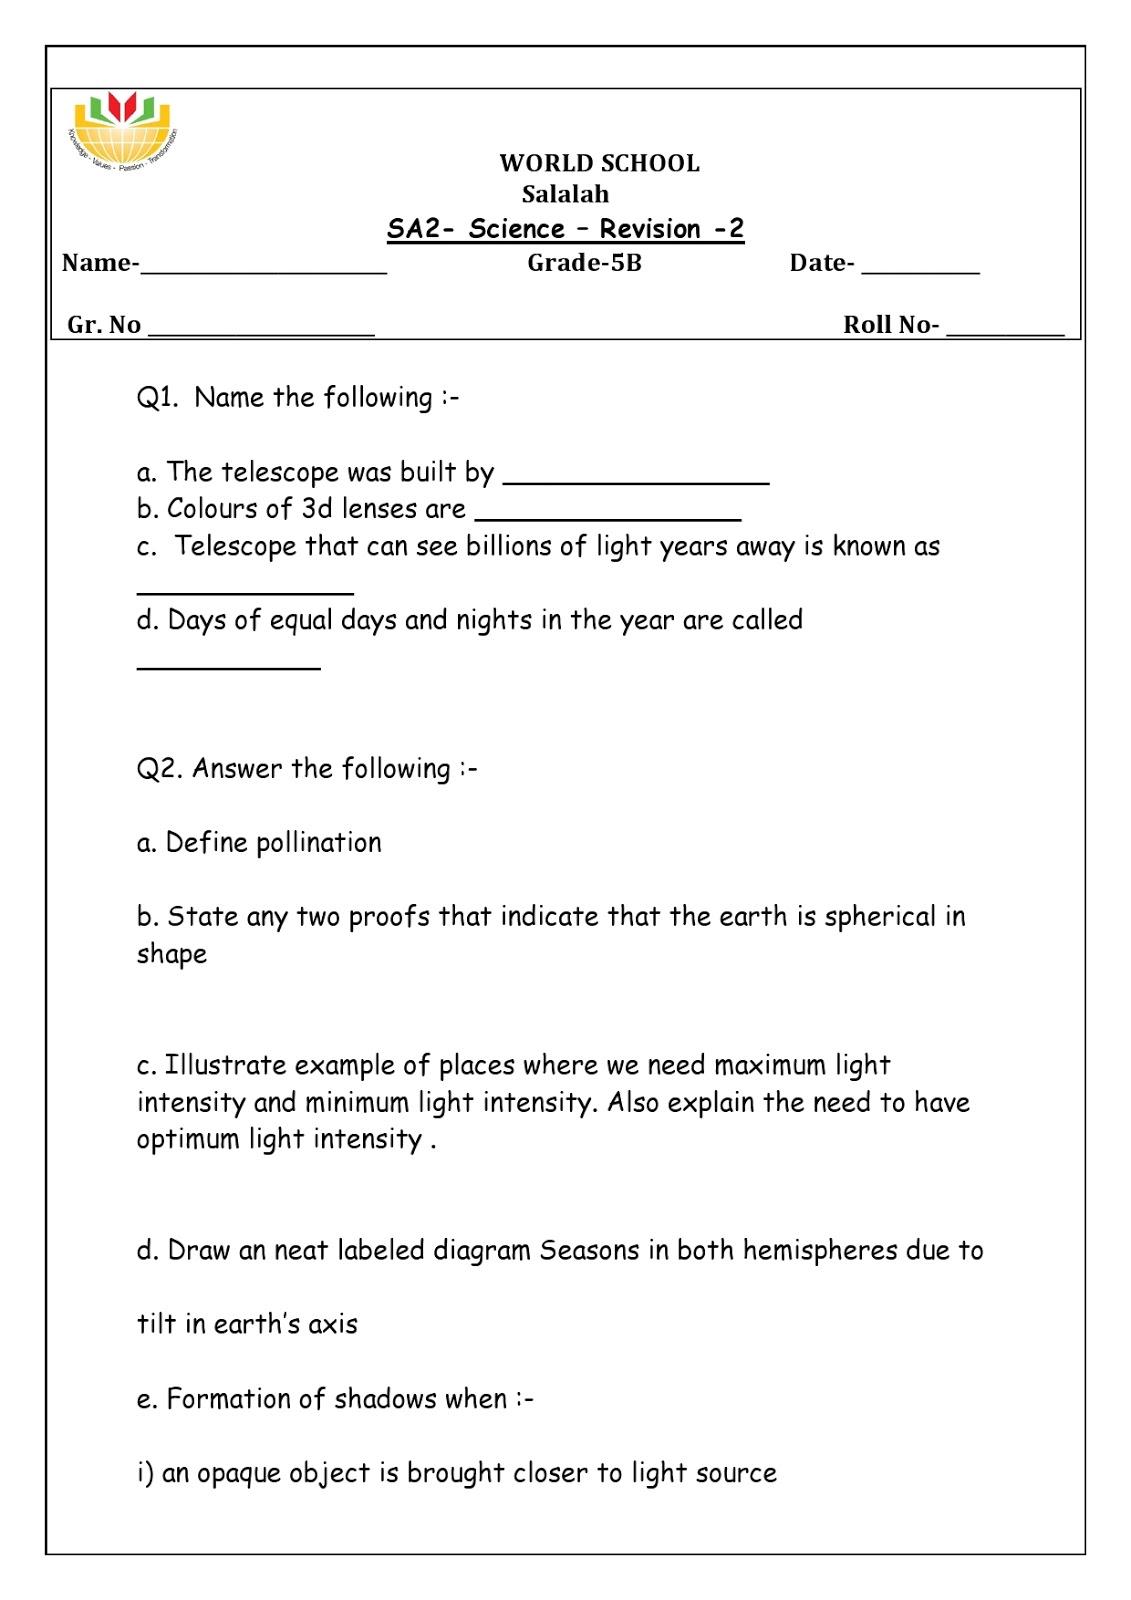 Birla World School Oman Homework For Grade 5 As On 16 04